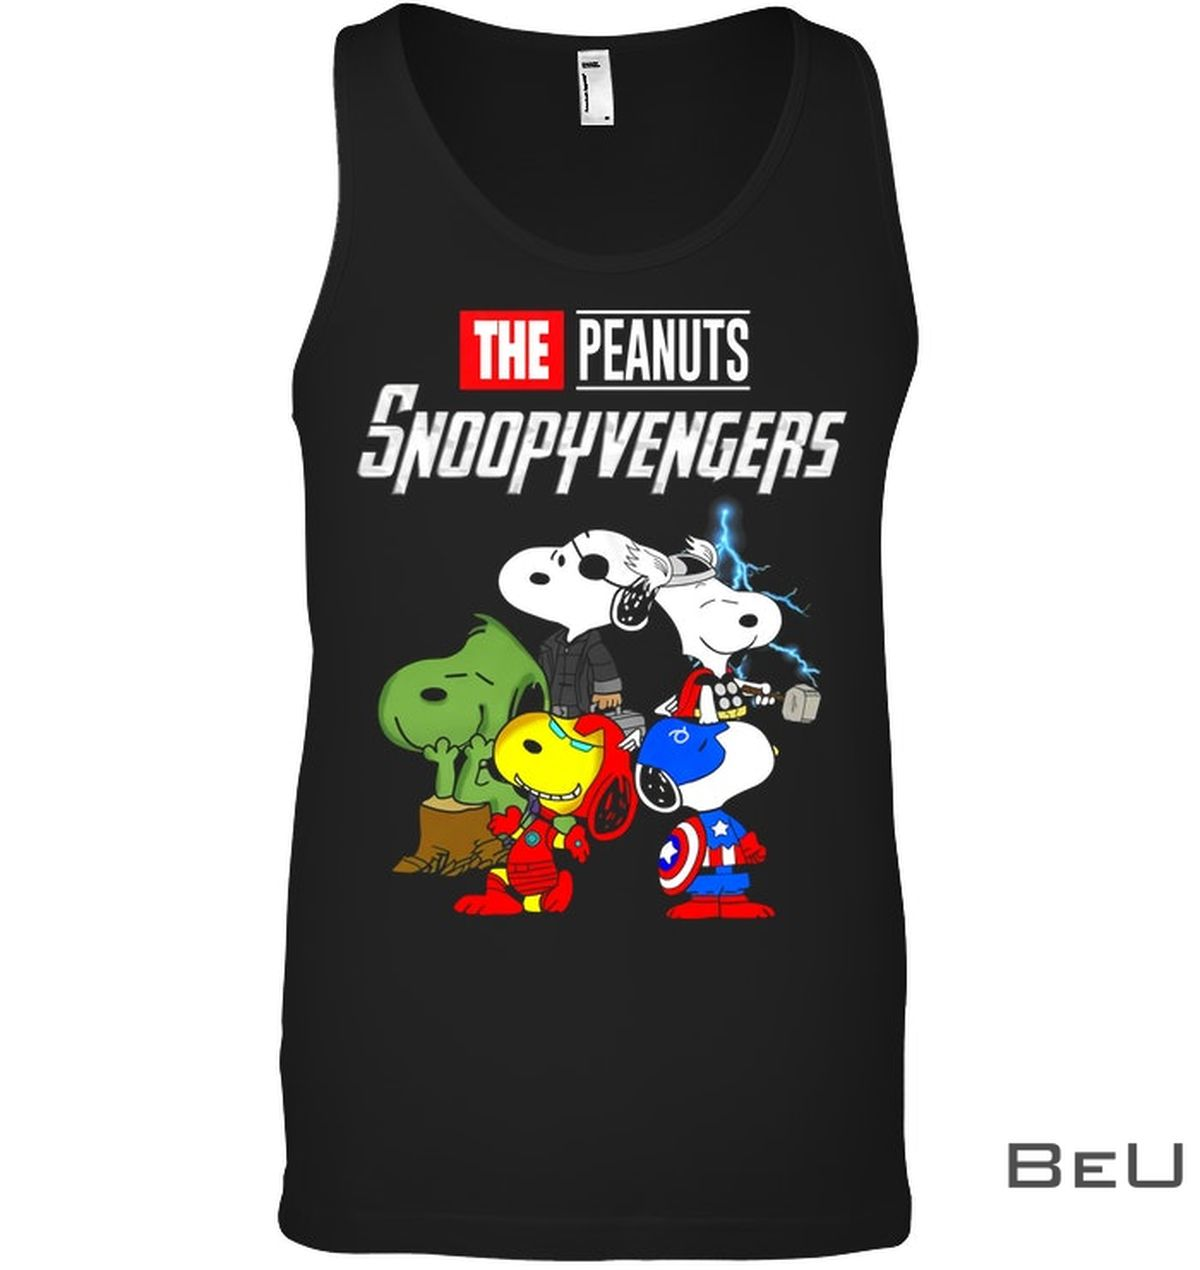 Snoopy Avengers The Peanuts Movie Shirtc